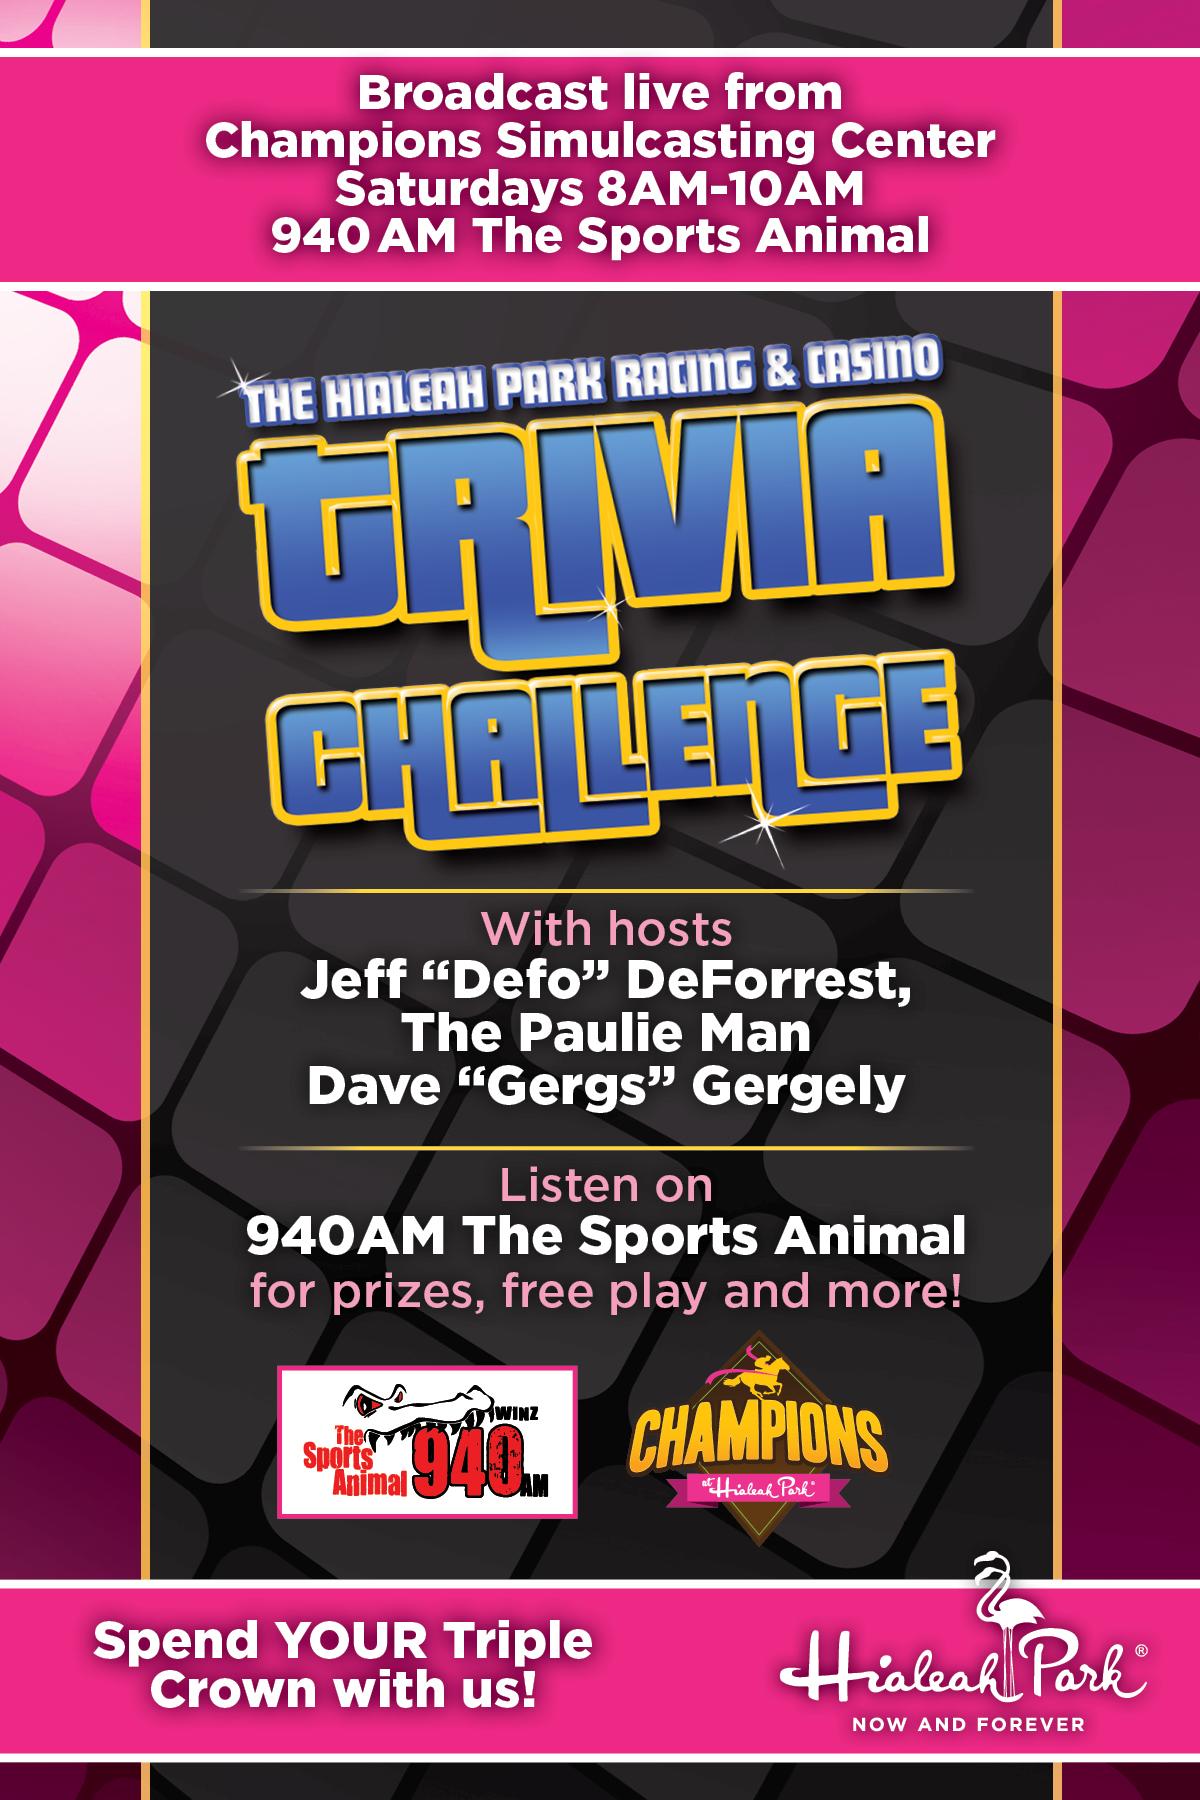 Take the 940 WINZ Trivia Challenge! - MutComm com